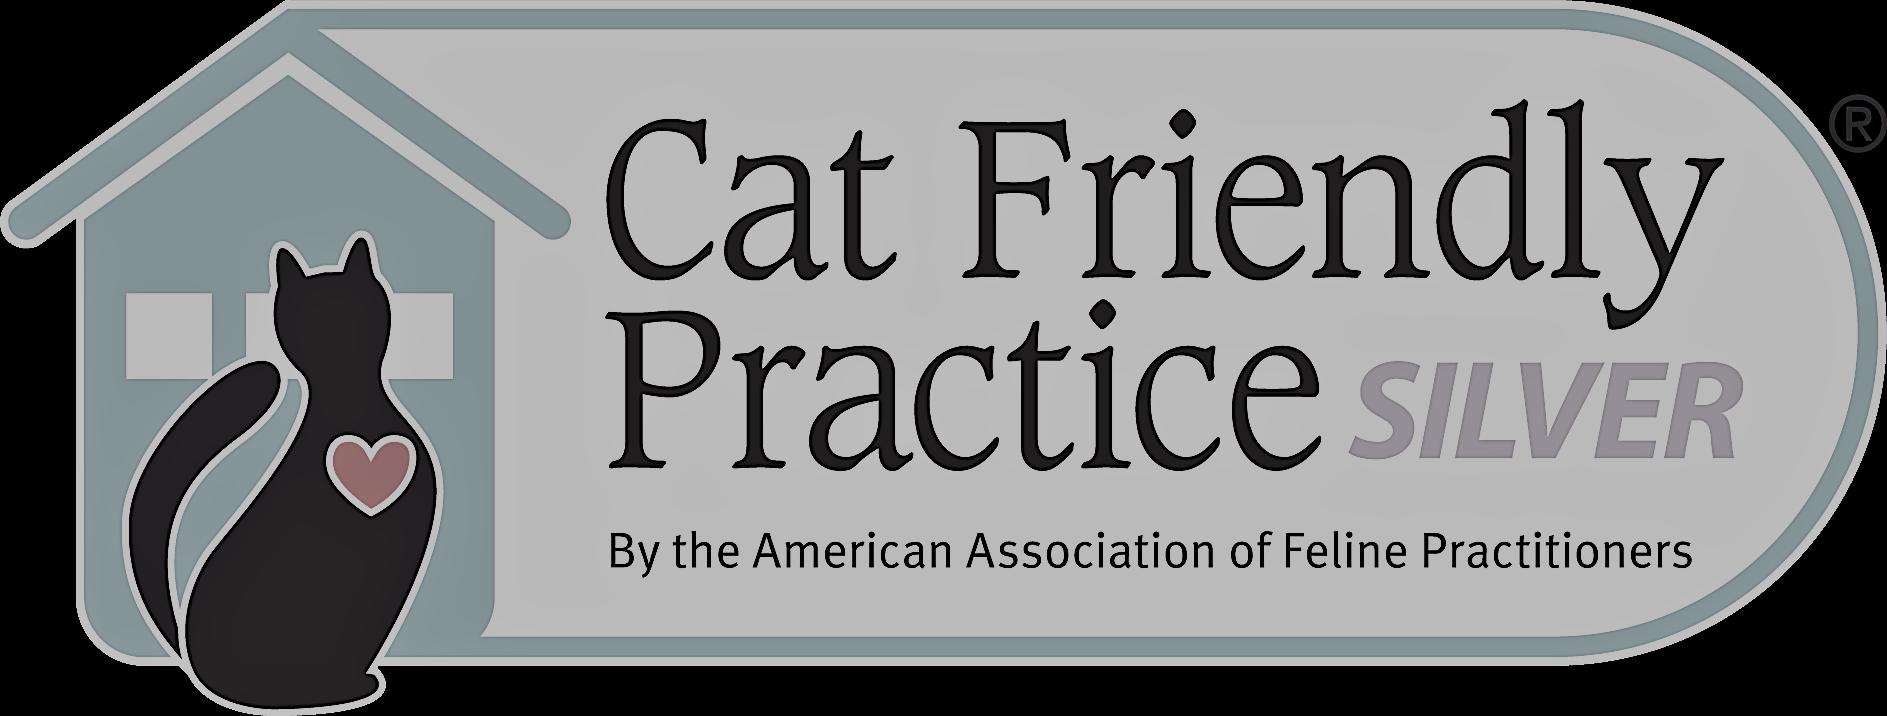 Cat_Friendly_Logo_Silver - B&W.png